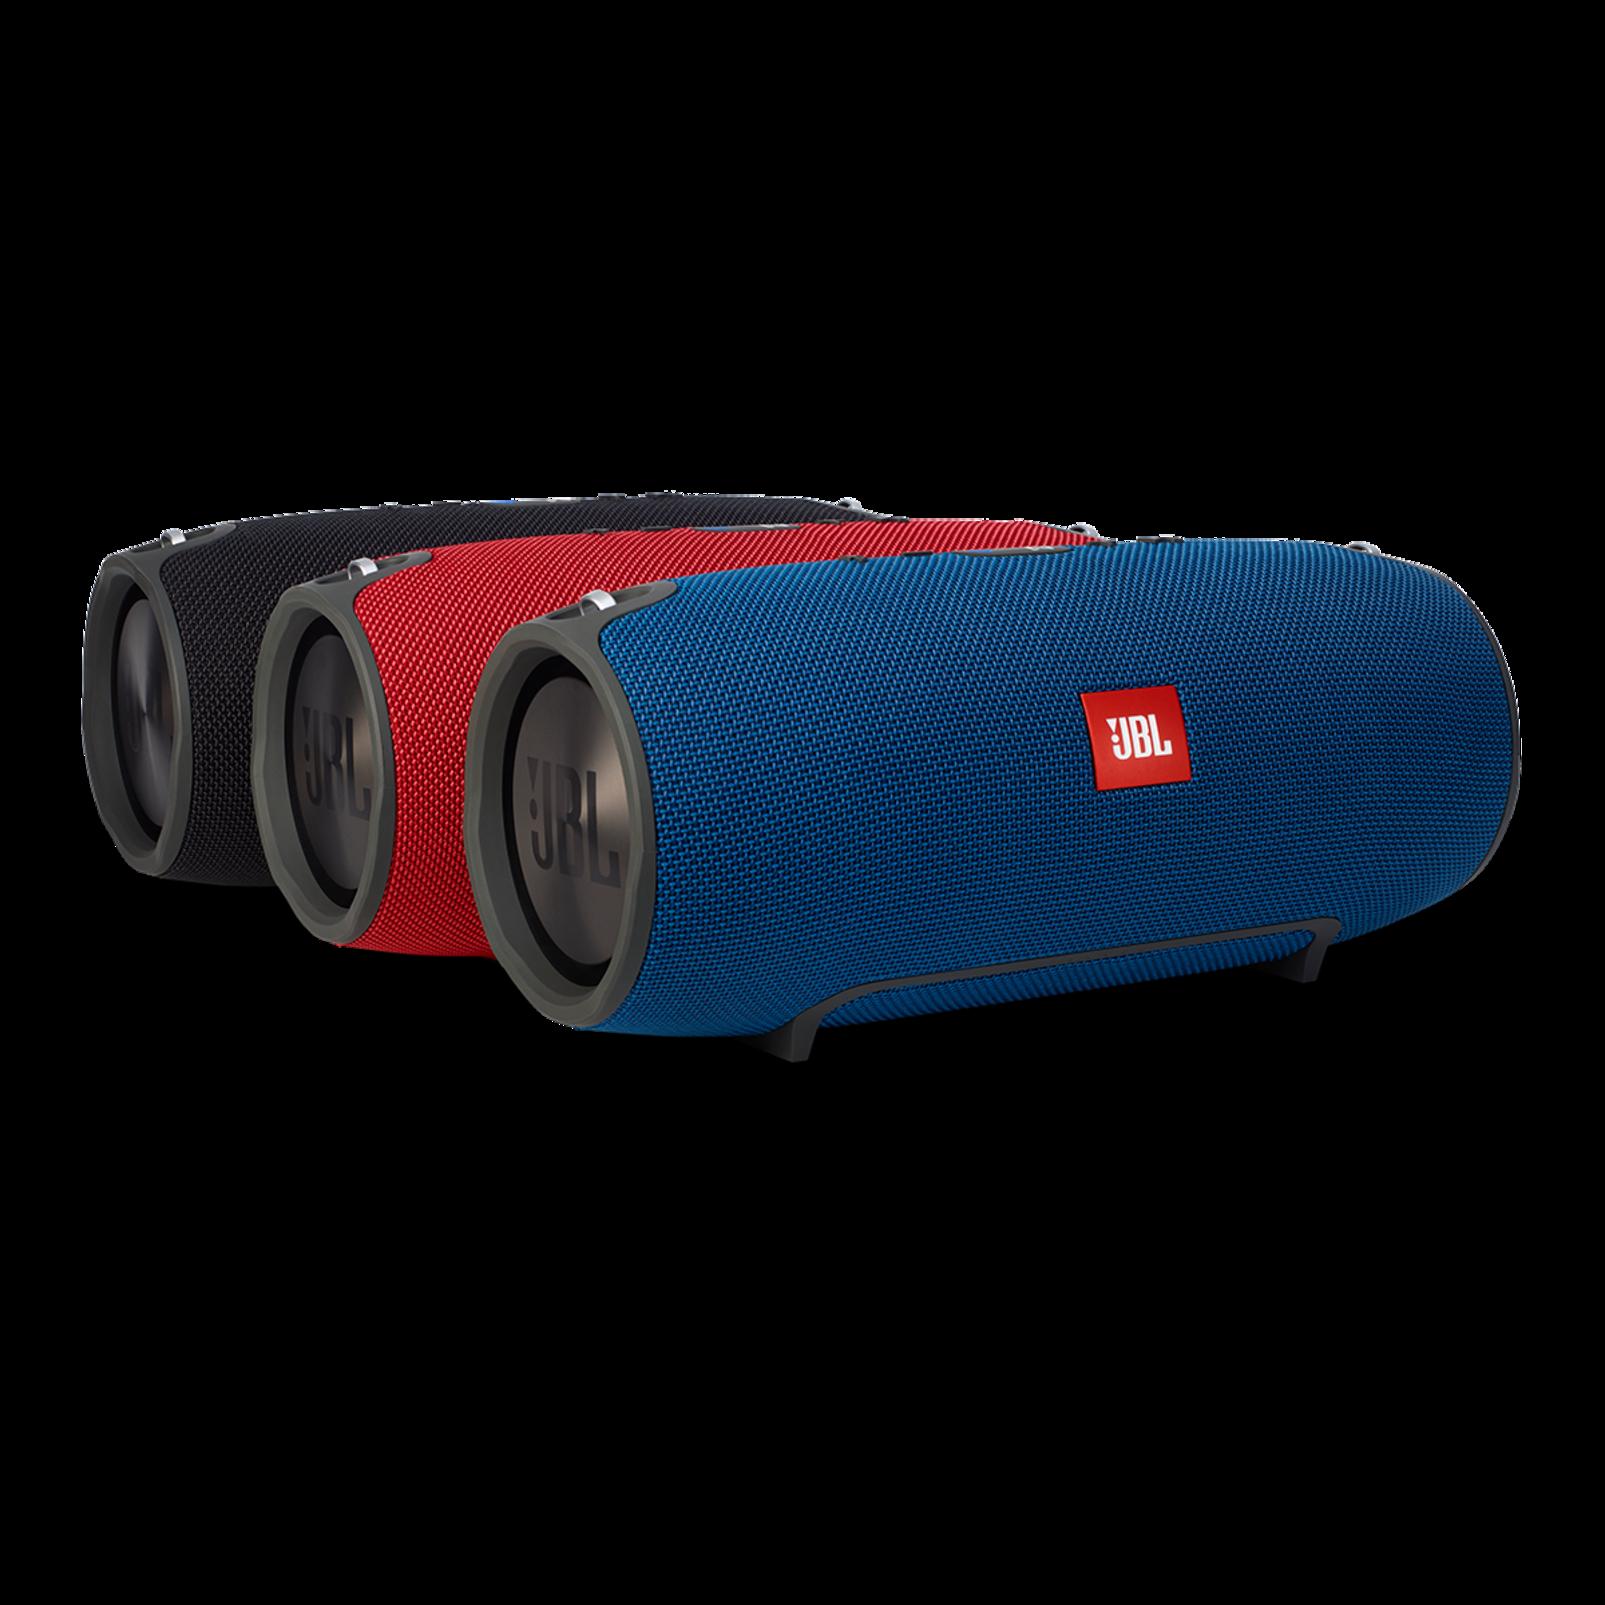 JBL Xtreme - Black - Splashproof portable speaker with ultra-powerful performance - Detailshot 5